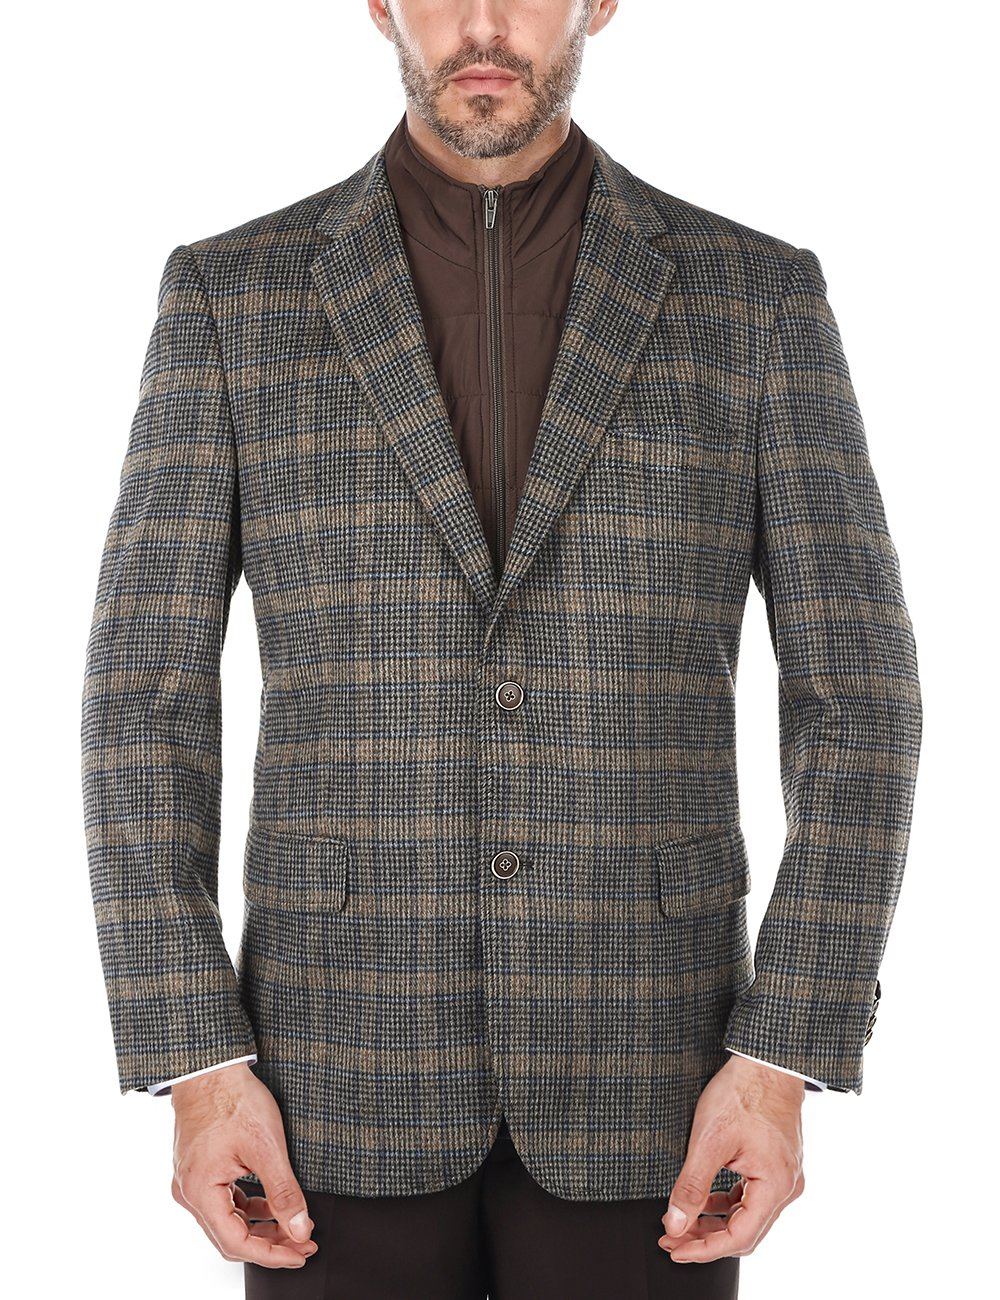 Chama Men's Plaid Wool Blazer, Sports Coat with Removable Bib (Brown, 42L)